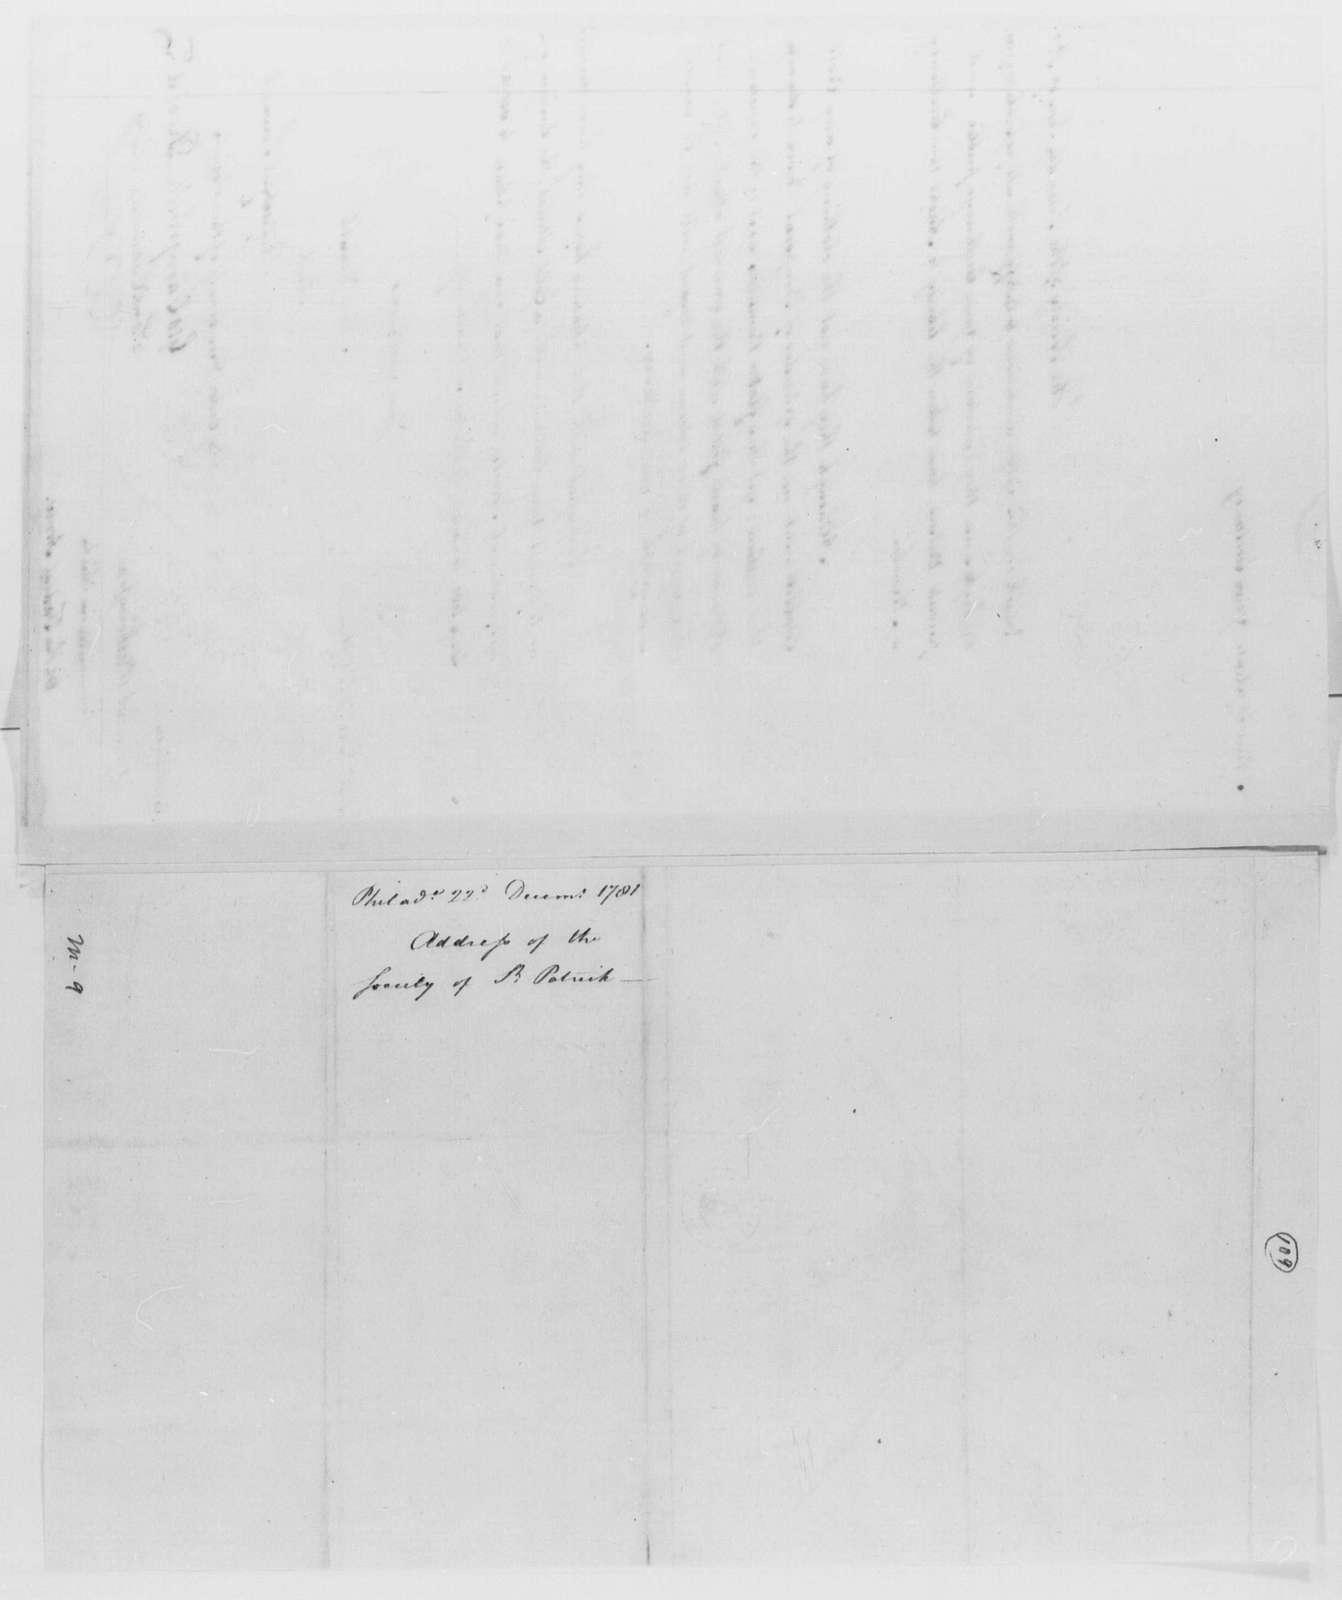 George Washington Papers, Series 4, General Correspondence: Philadelphia St. Patrick Society to George Washington, December 22, 1781